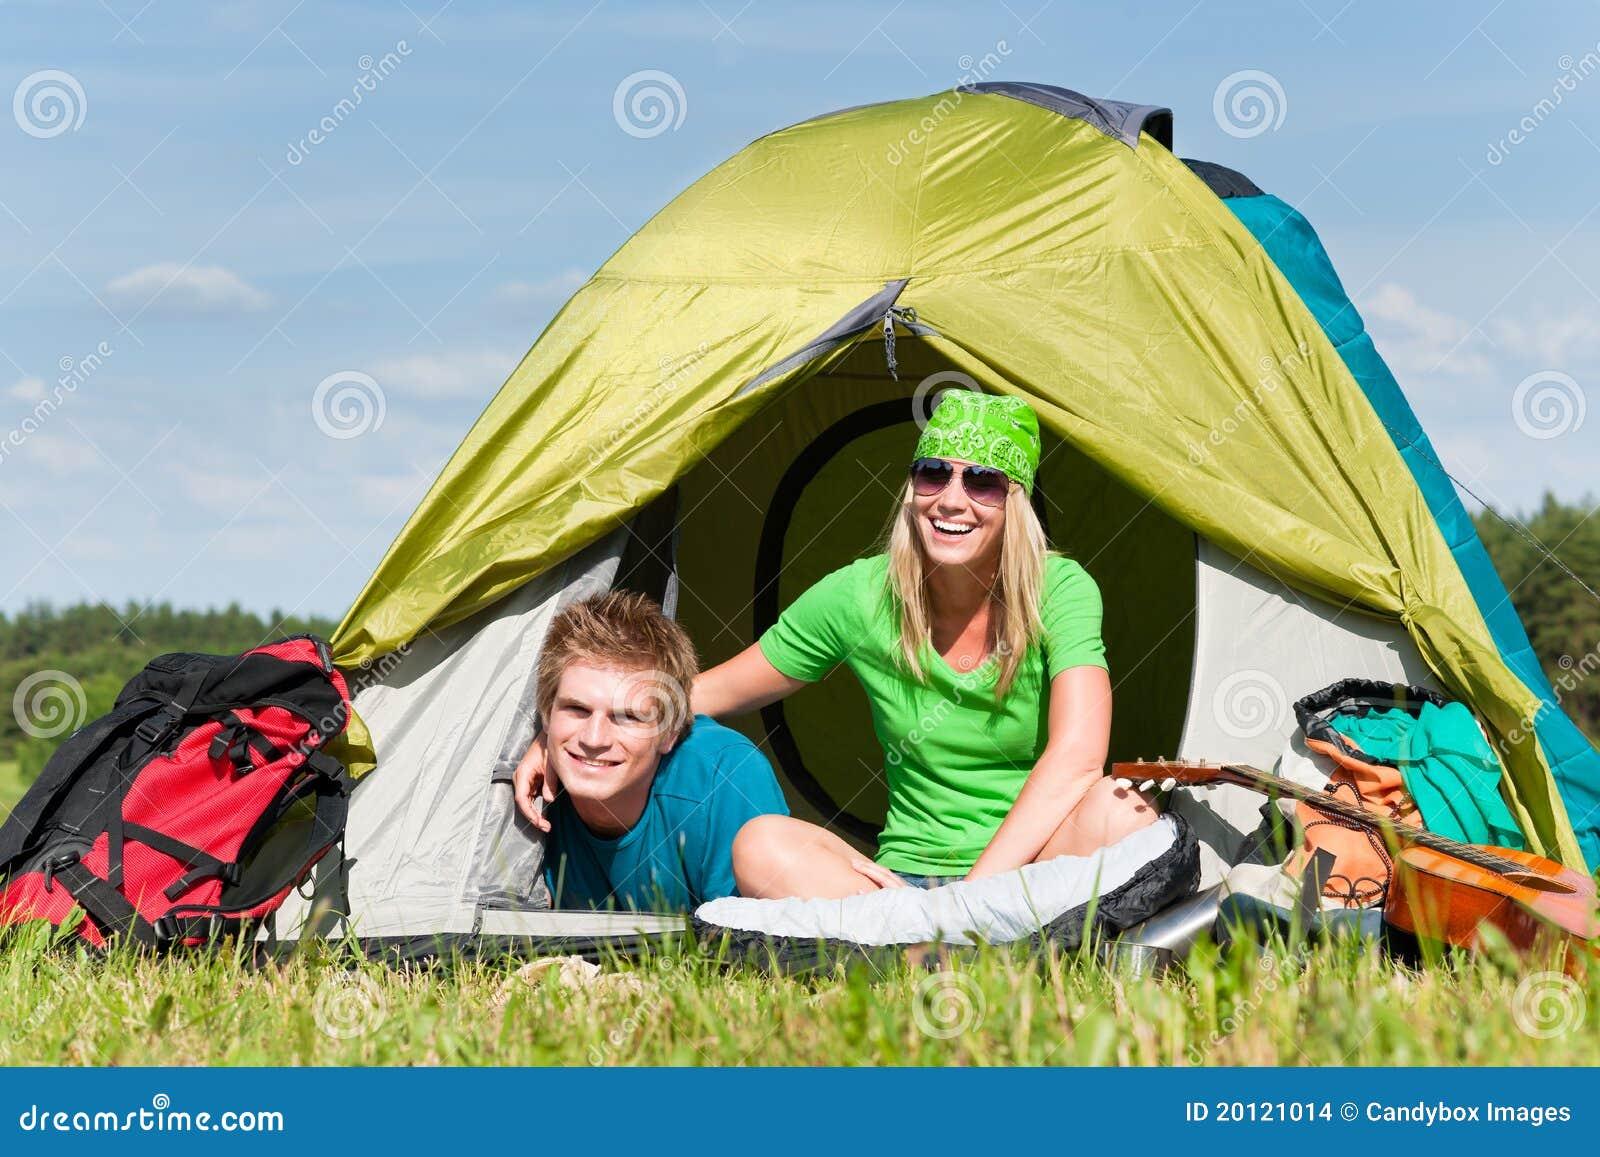 C&ing couple lying inside tent summer  sc 1 st  Dreamstime.com & Camping Couple Lying Inside Tent Summer Stock Photo - Image: 20121014